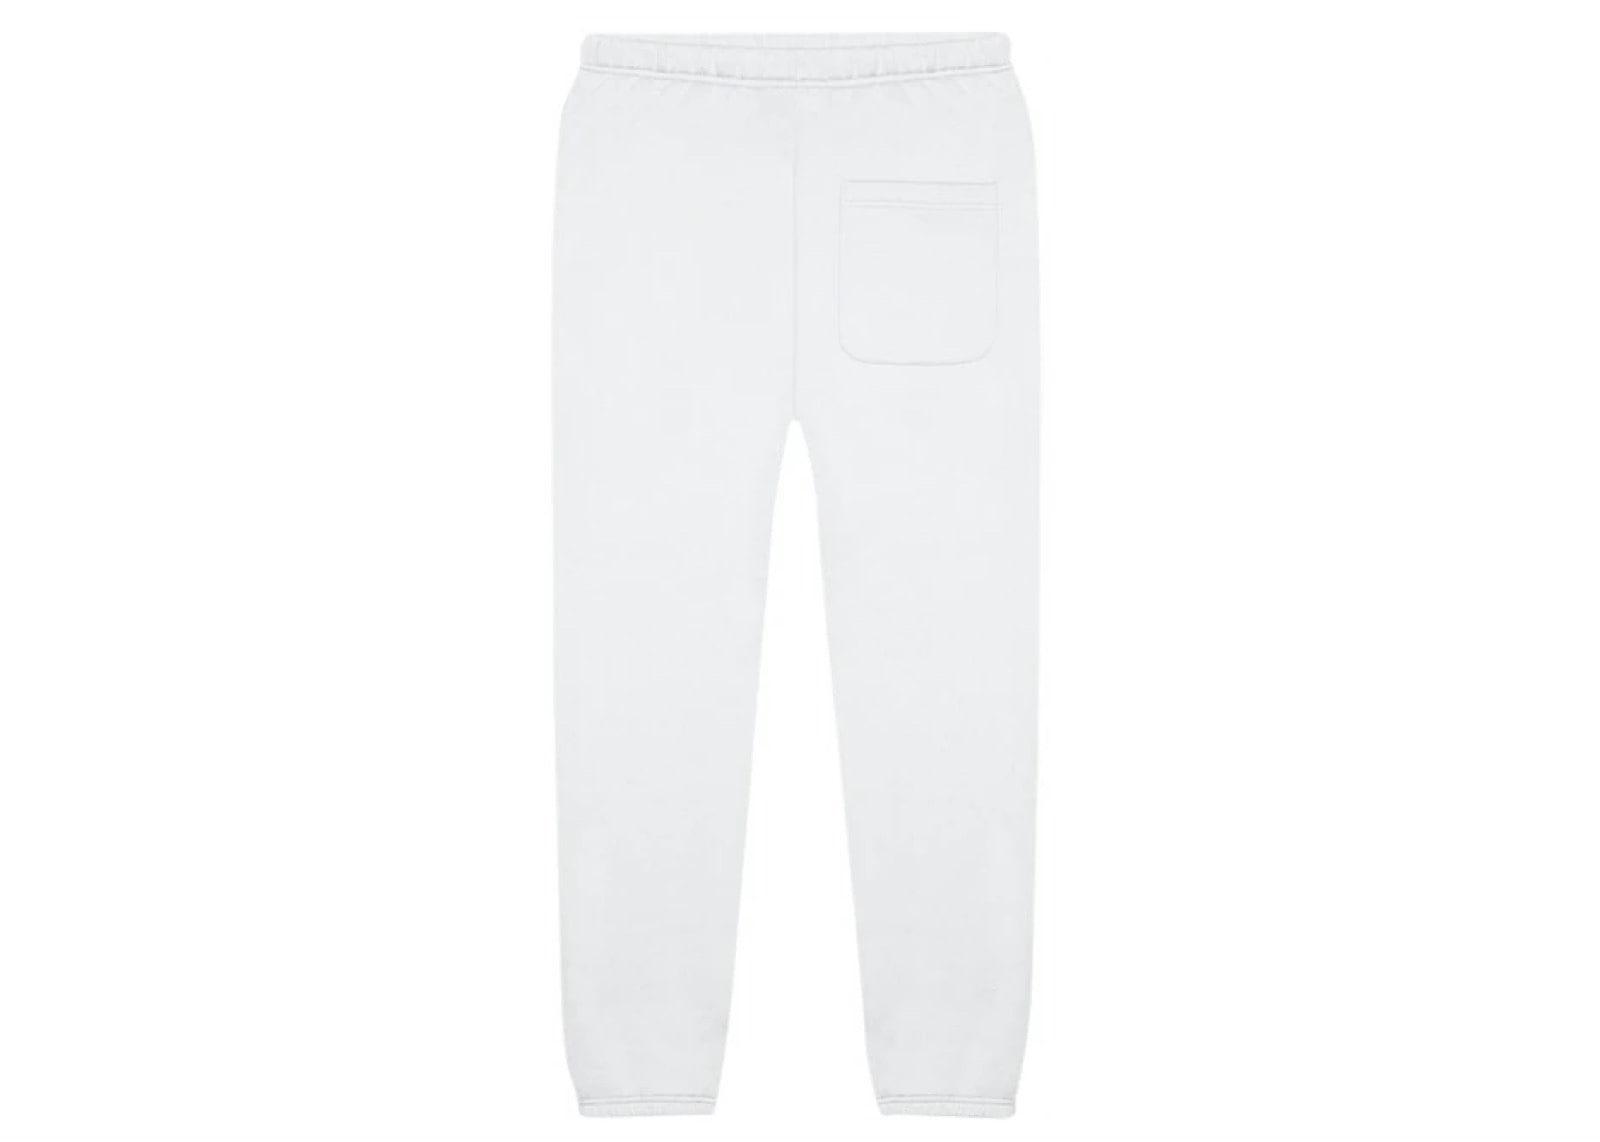 slide 2 - White Sweatpants